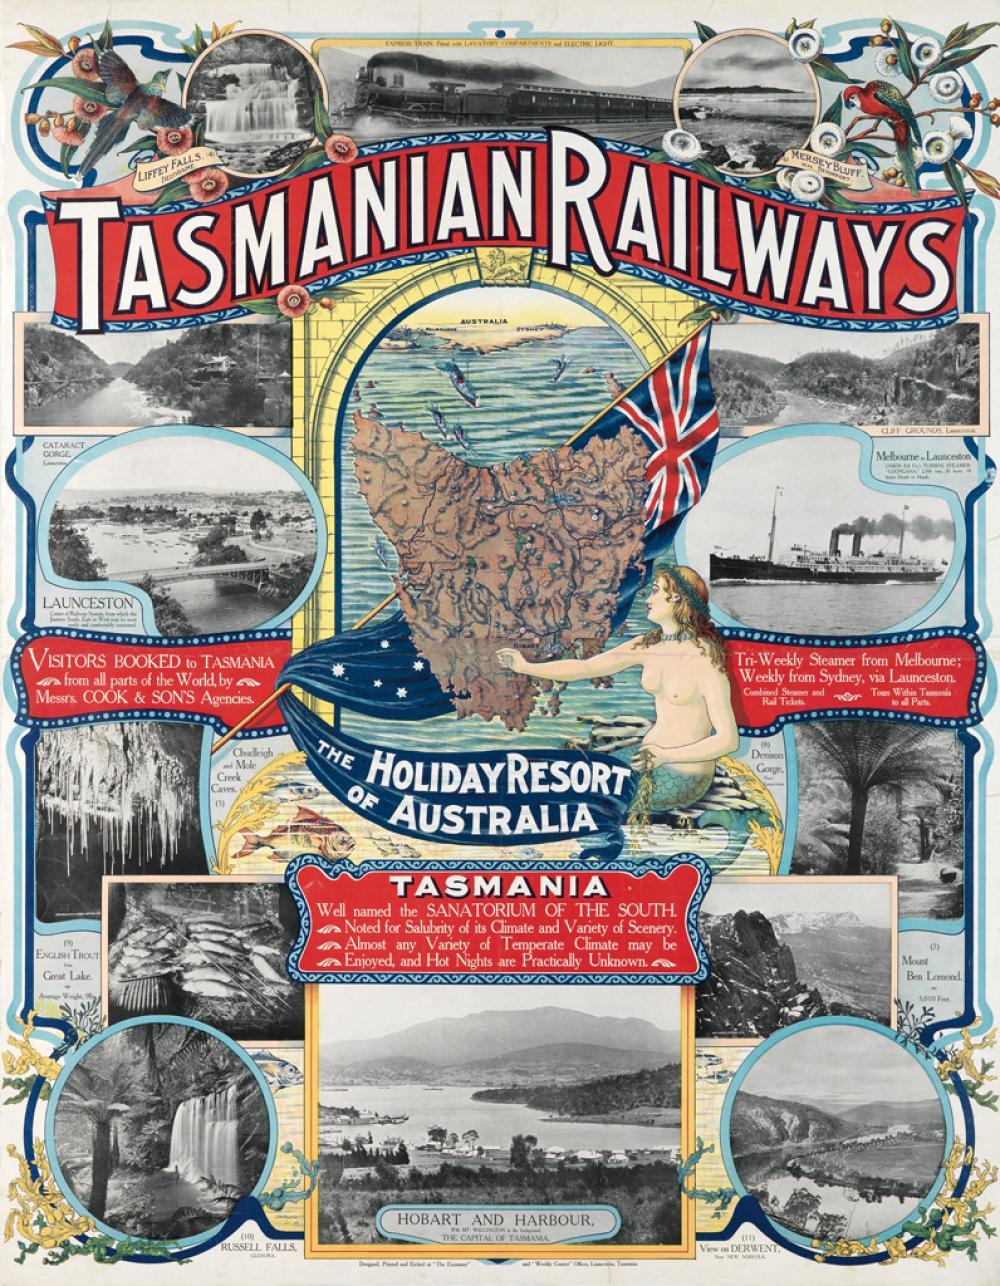 J.M. PROCTOR (DATES UNKNOWN). TASMANIAN RAILWAYS / THE HOLIDAY RESORT OF AUSTRALIA. 1905. 45x35 inches, 115x89 cm.